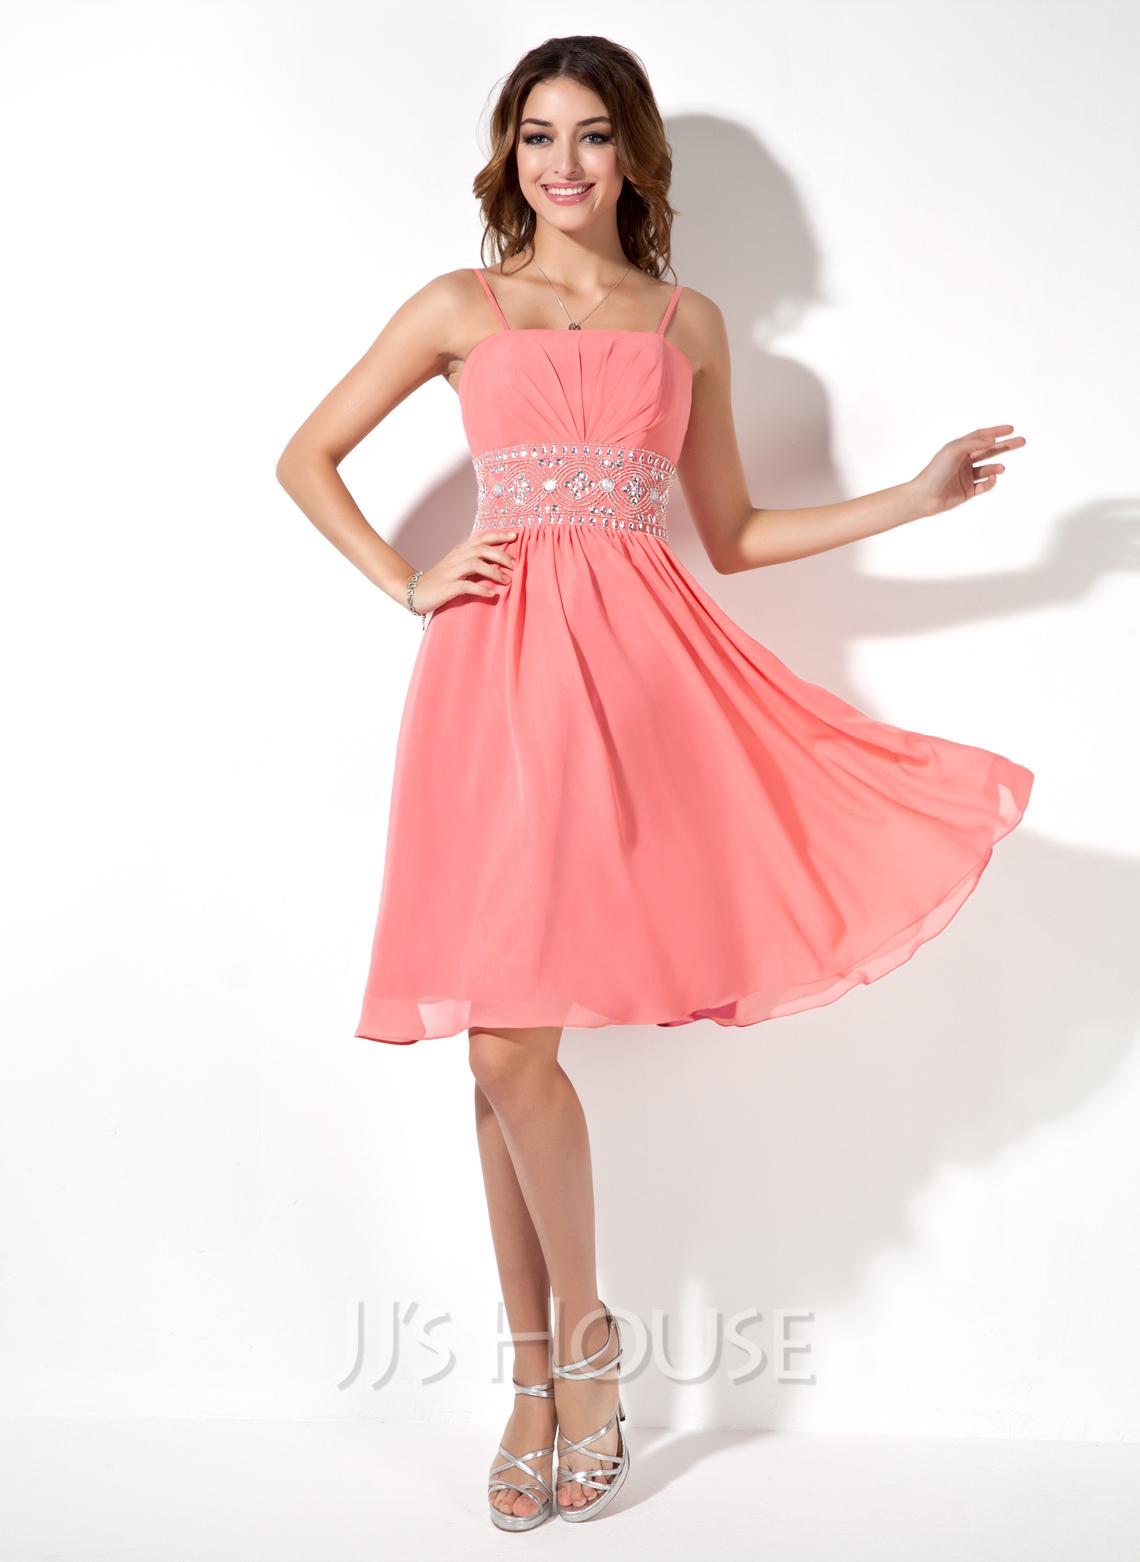 A-Line Square Neckline Knee-Length Chiffon Homecoming Dress With Ruffle Beading